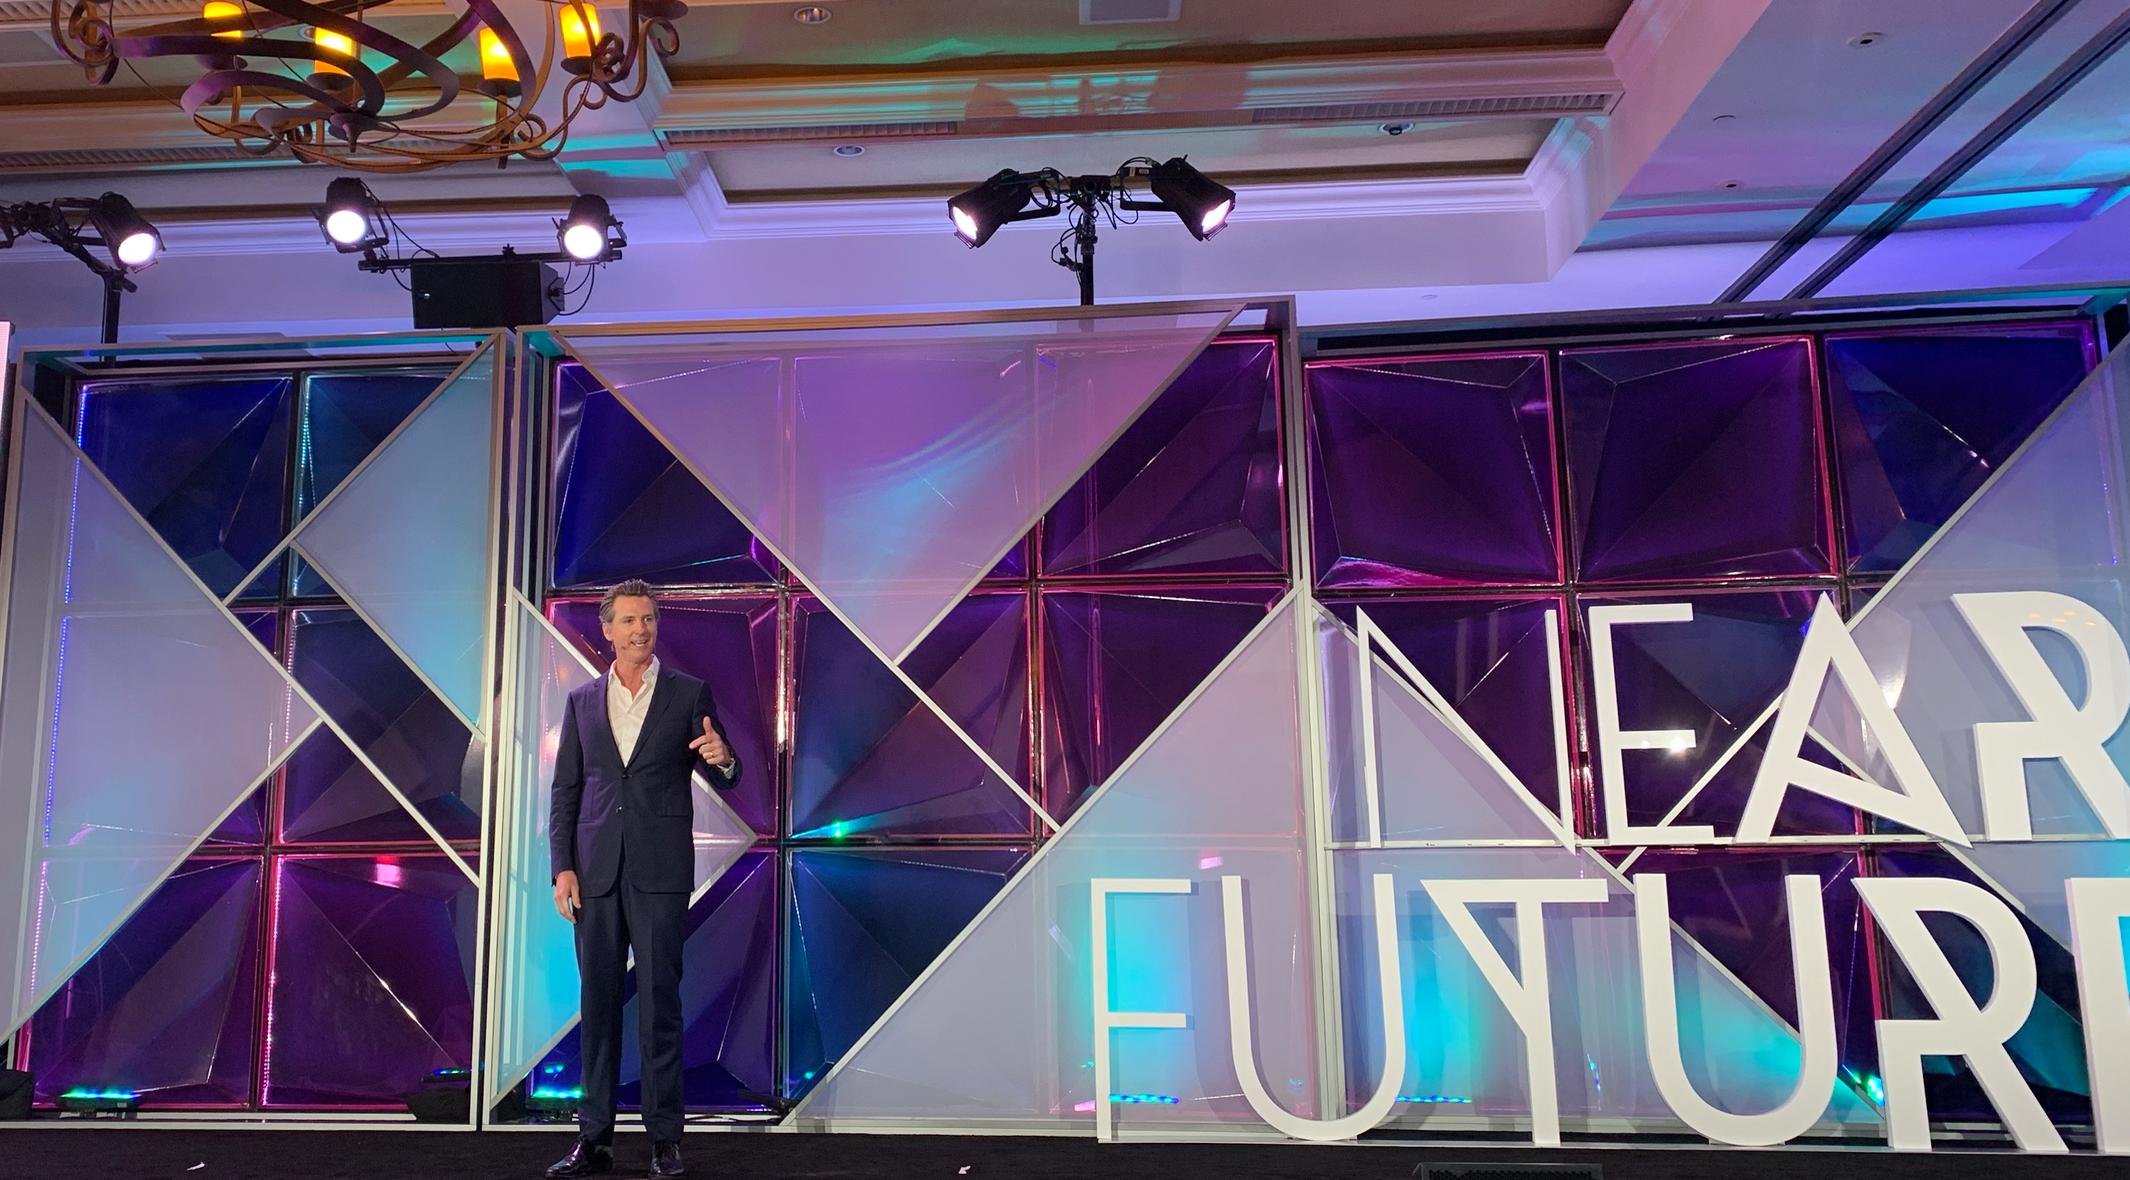 Gavin Newsom at the near future summit